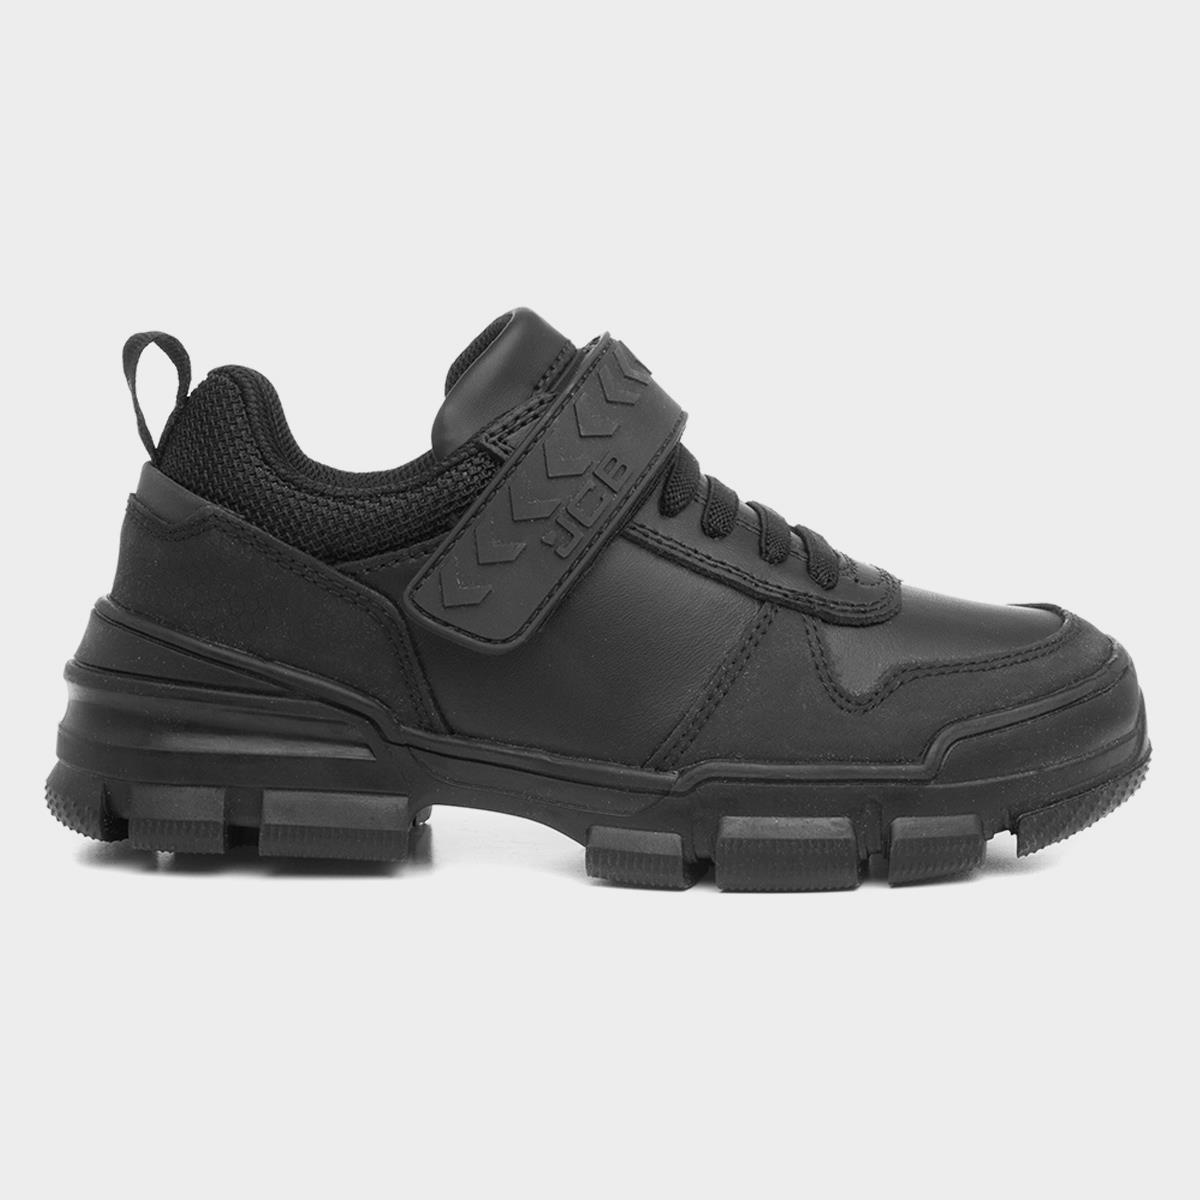 JCB Halmer Black Leather Easy Fasten Shoe